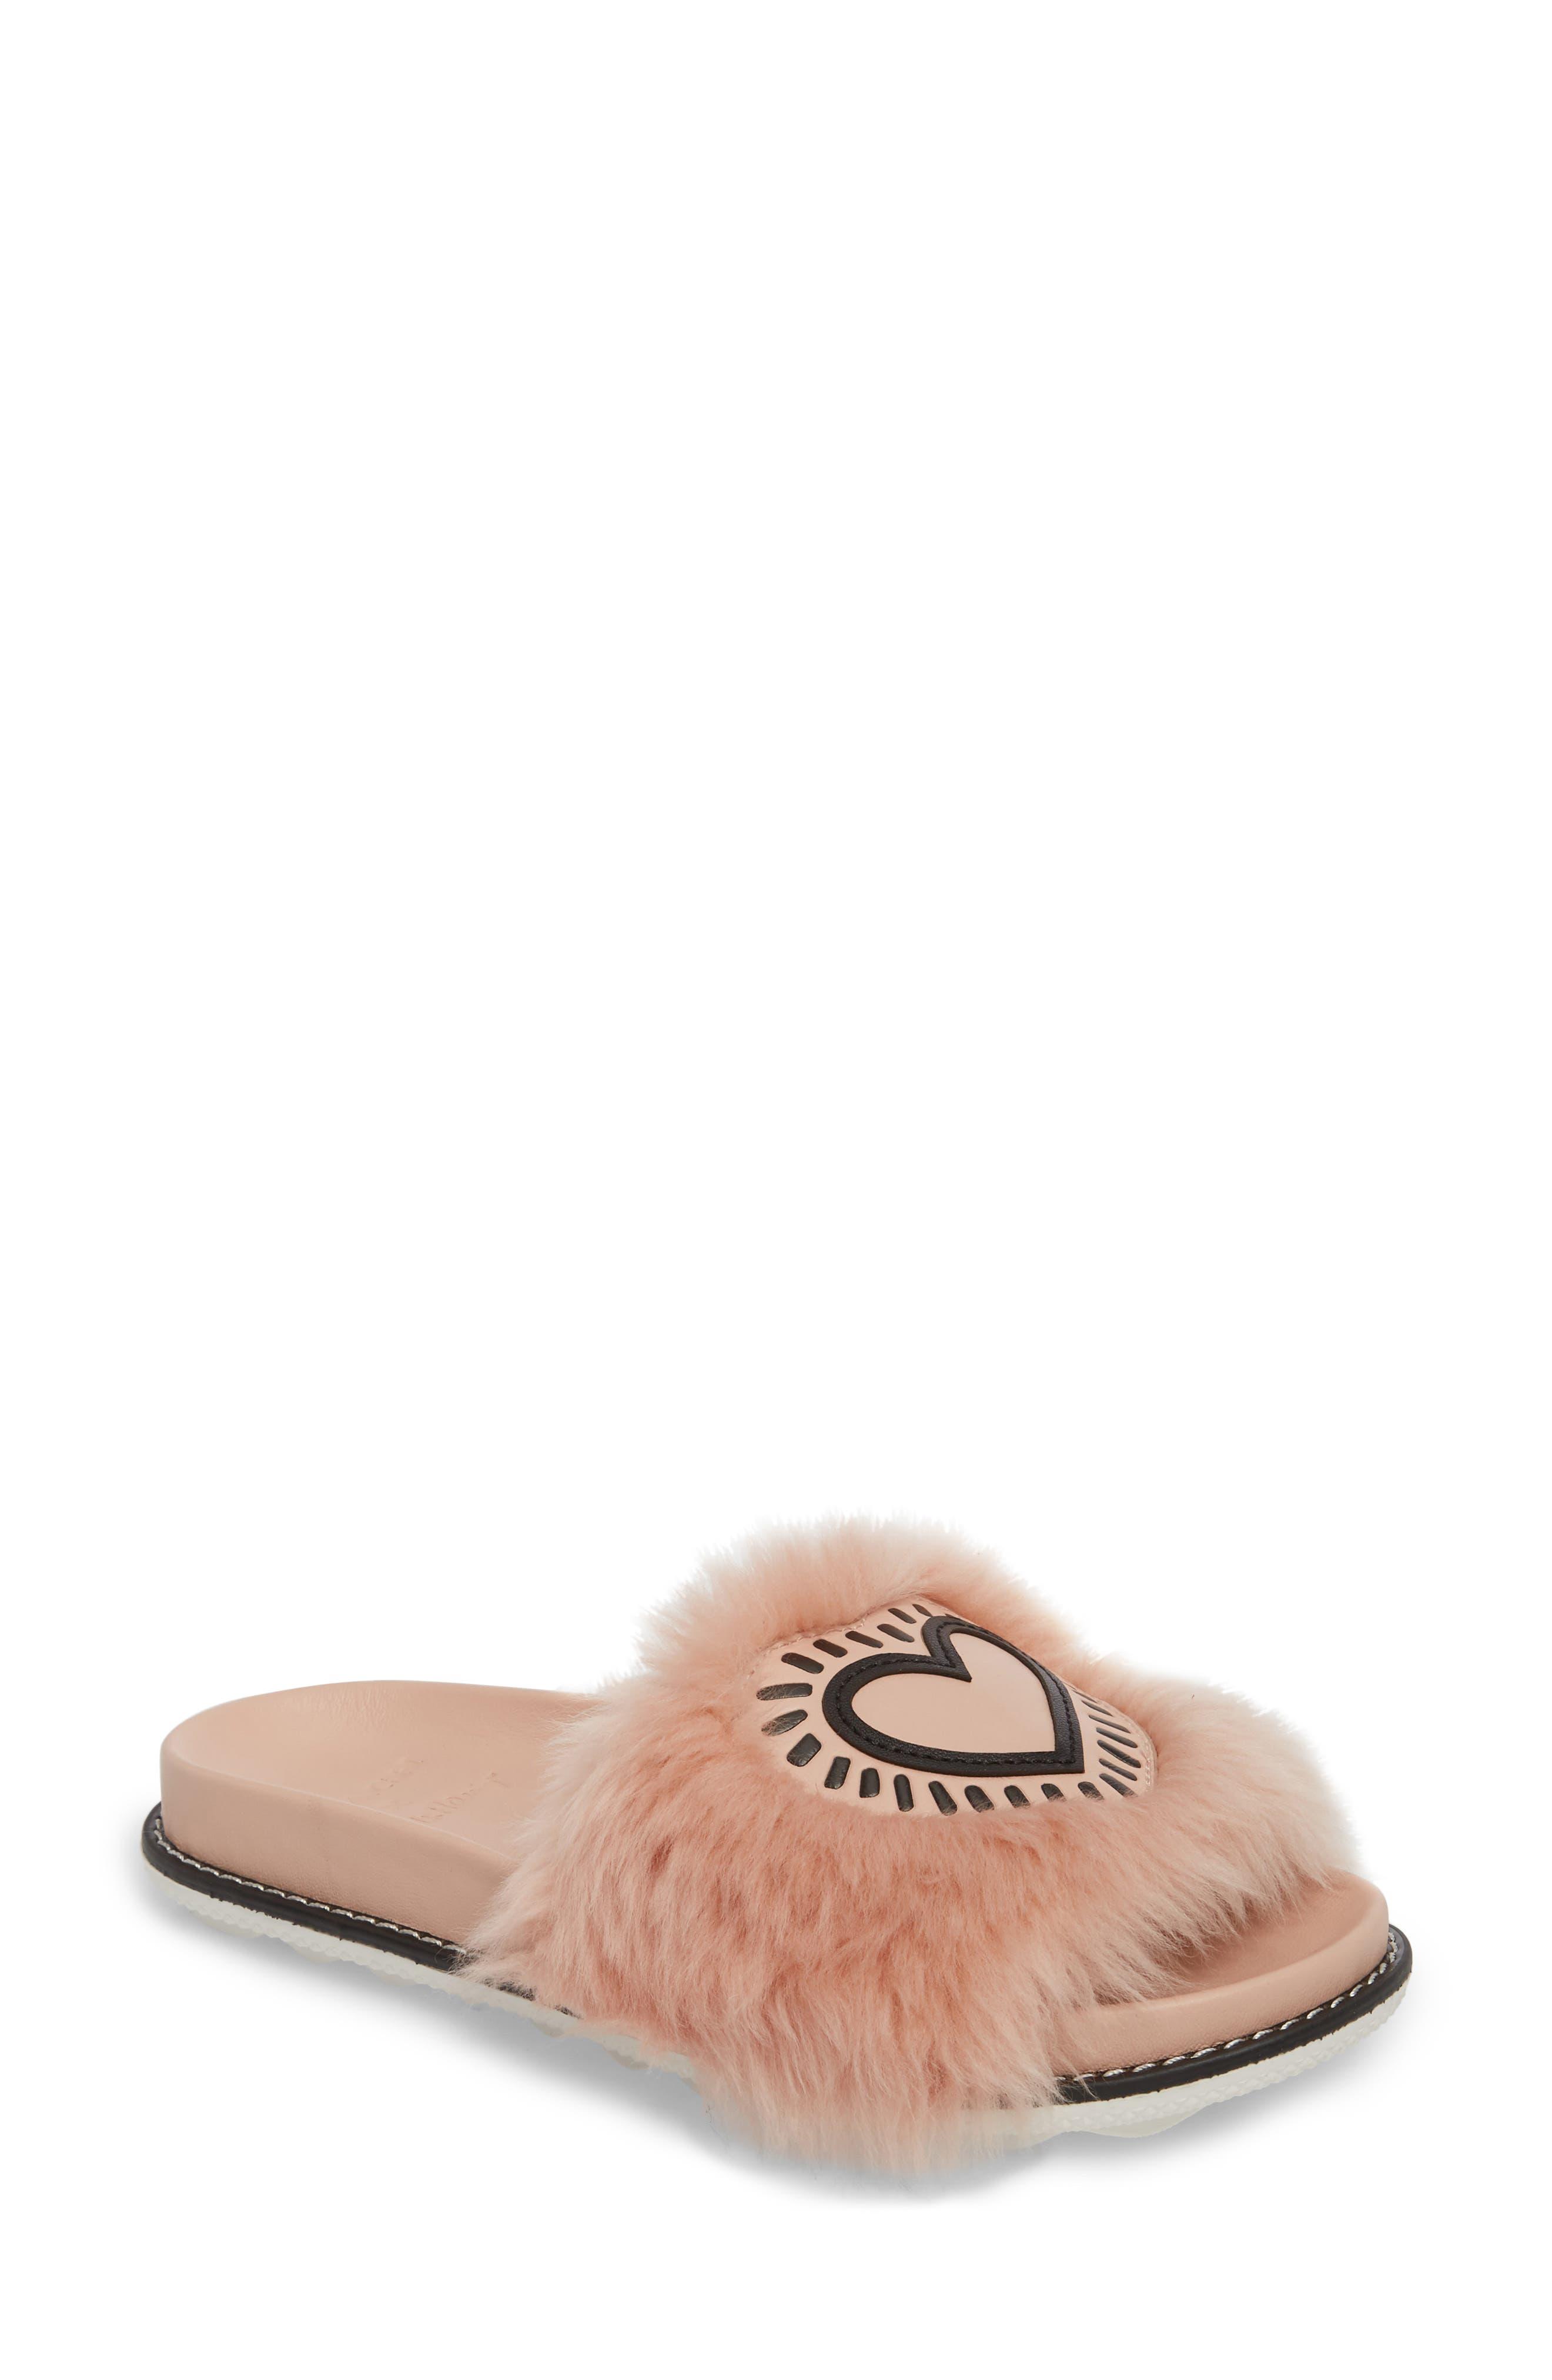 COACH x Keith Haring Genuine Shearling Slide Sandal (Women)